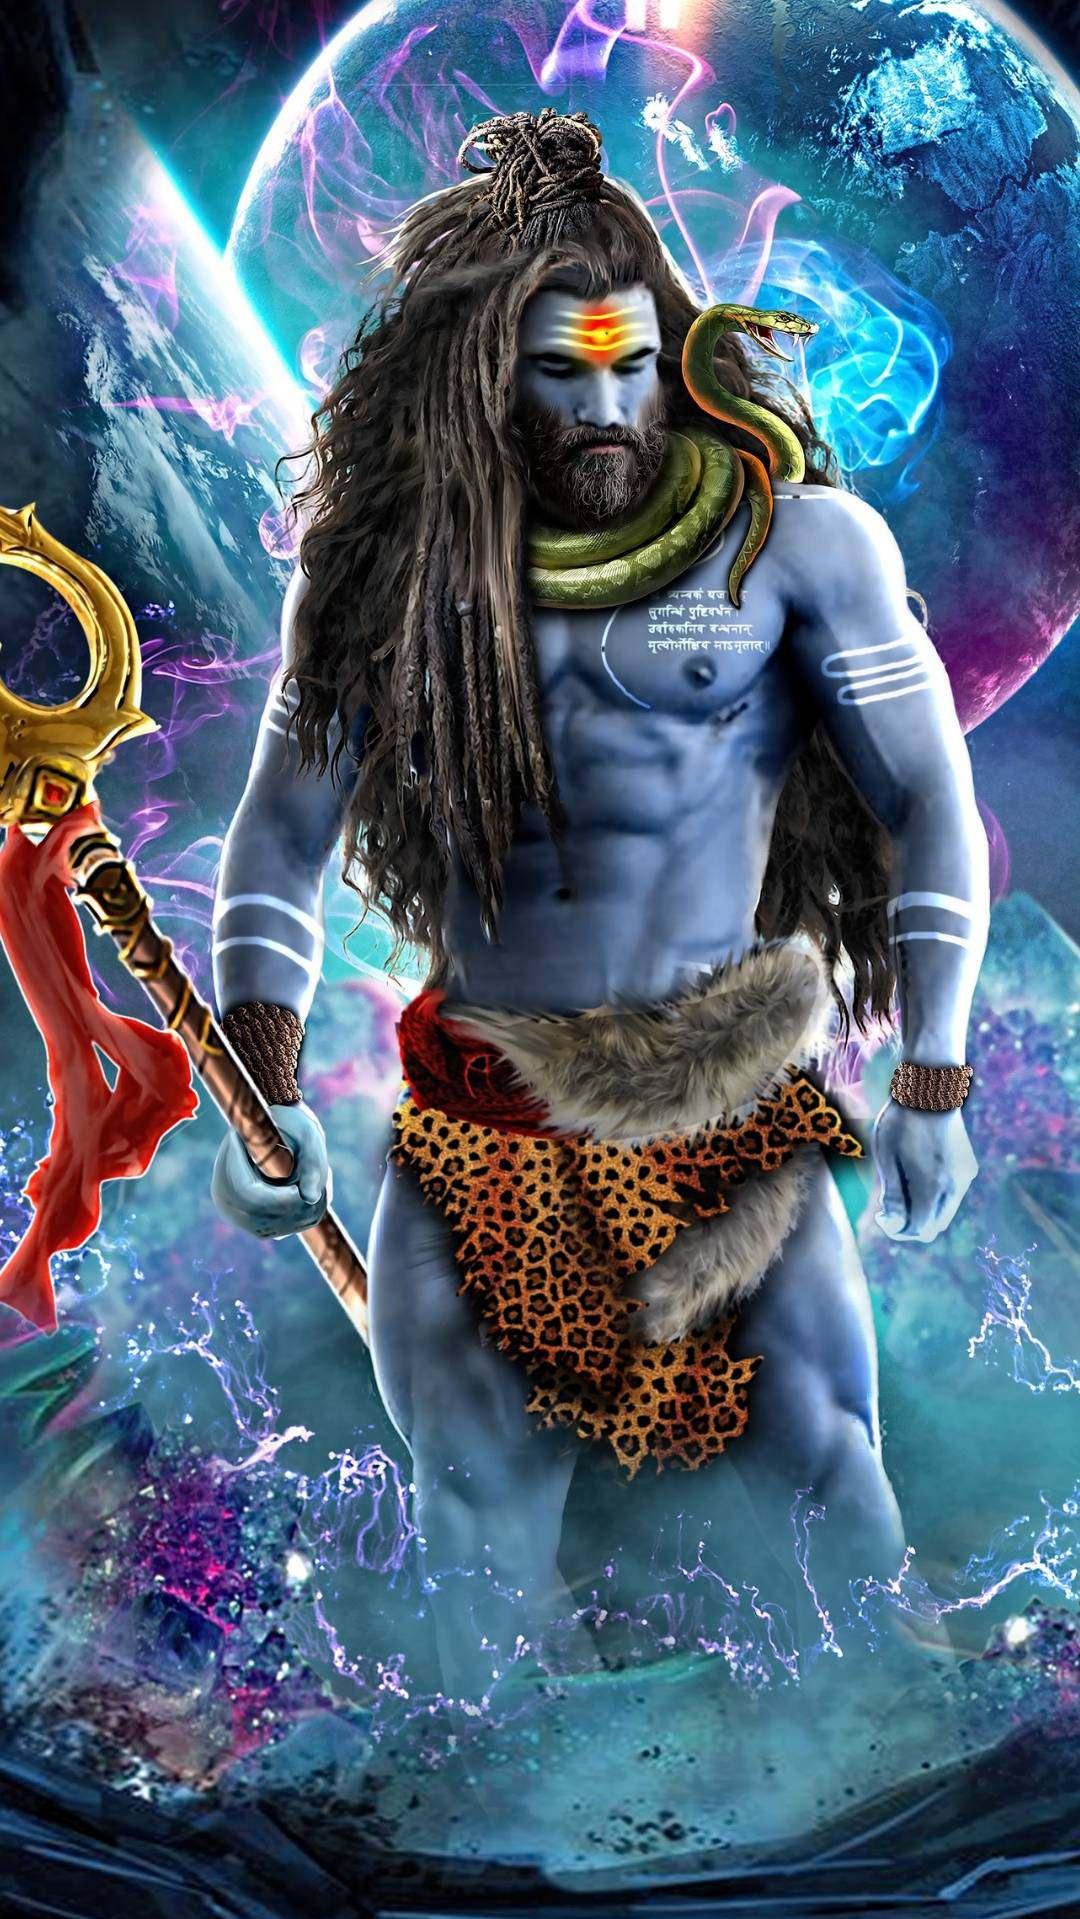 Lord Shiva Art iPhone Wallpaper  iPhone Wallpapers